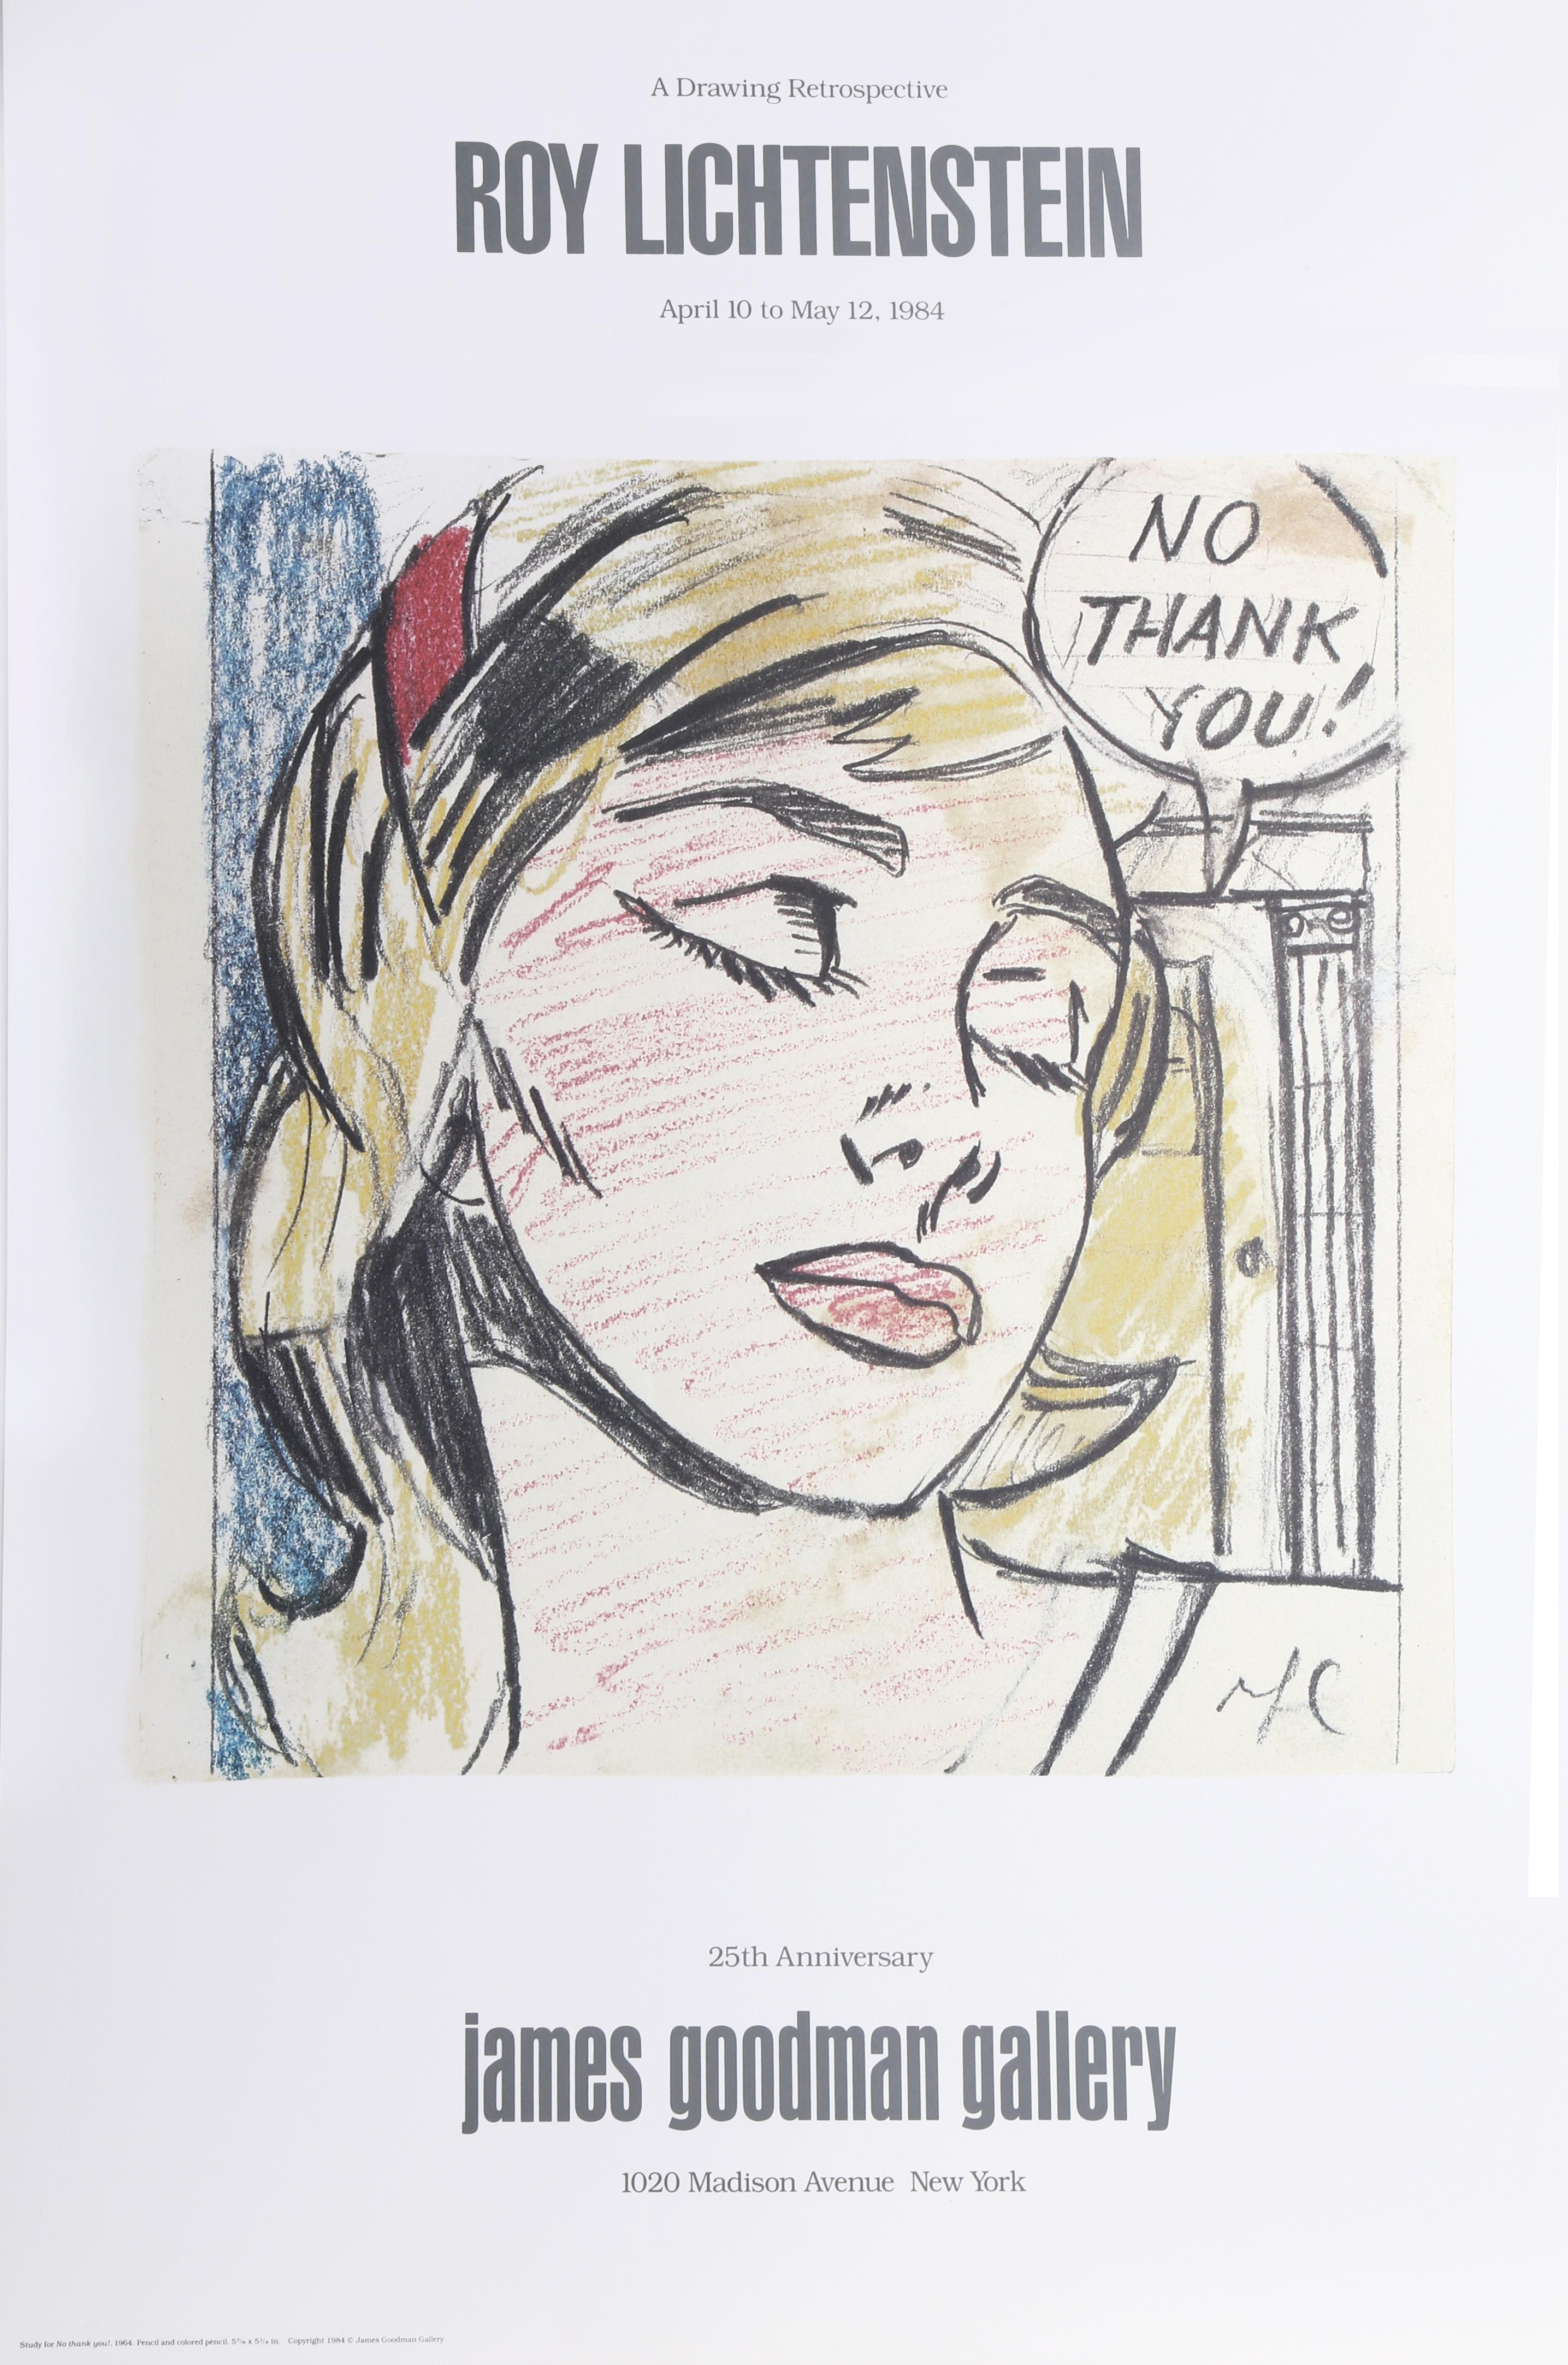 Roy Lichtenstein, No Thank You - James Goodman Gallery, Lithograph Poster